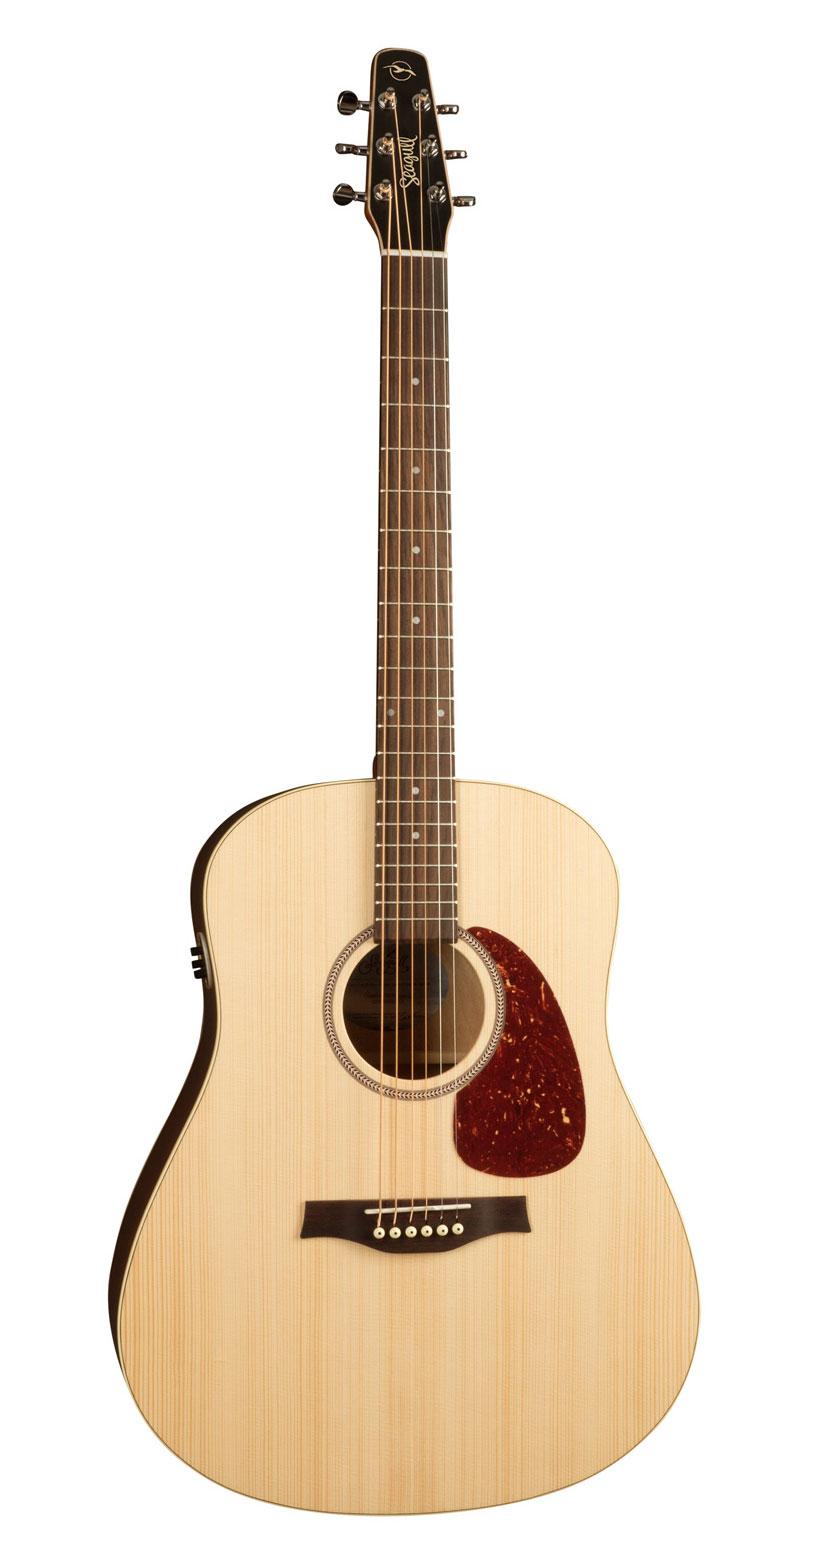 Seagull Coastline S6 Spruce QIT Acoustic Guitar